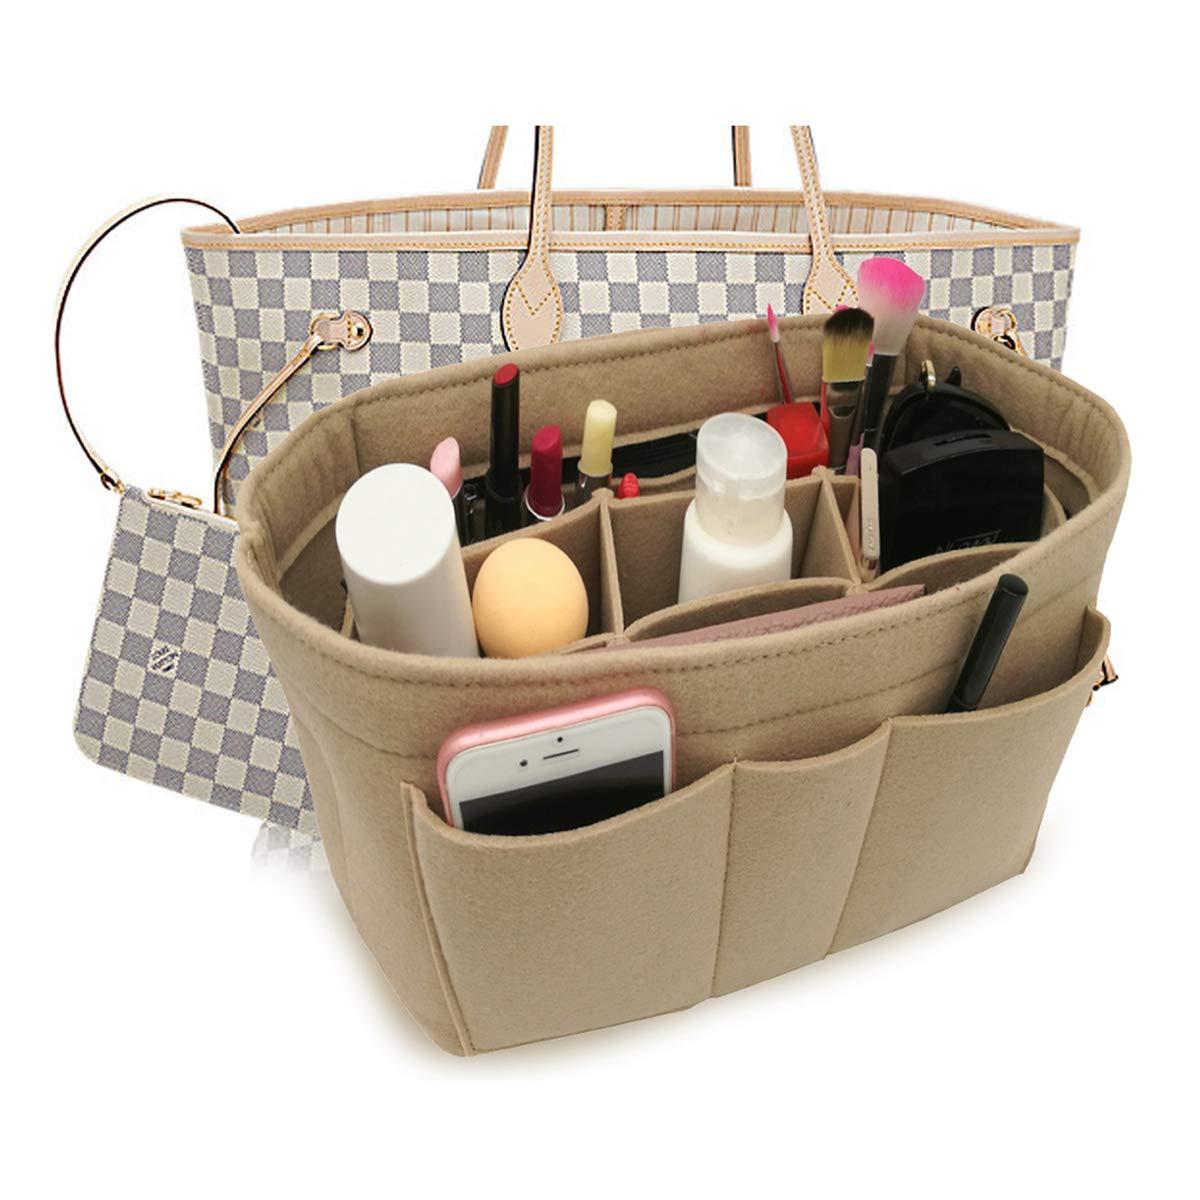 Felt Insert Fabric Purse Organizer Bag, Bag Insert In Bag with Zipper Inner Pocket Fits Neverfull Speedy 8010 Beige L by LEXSION